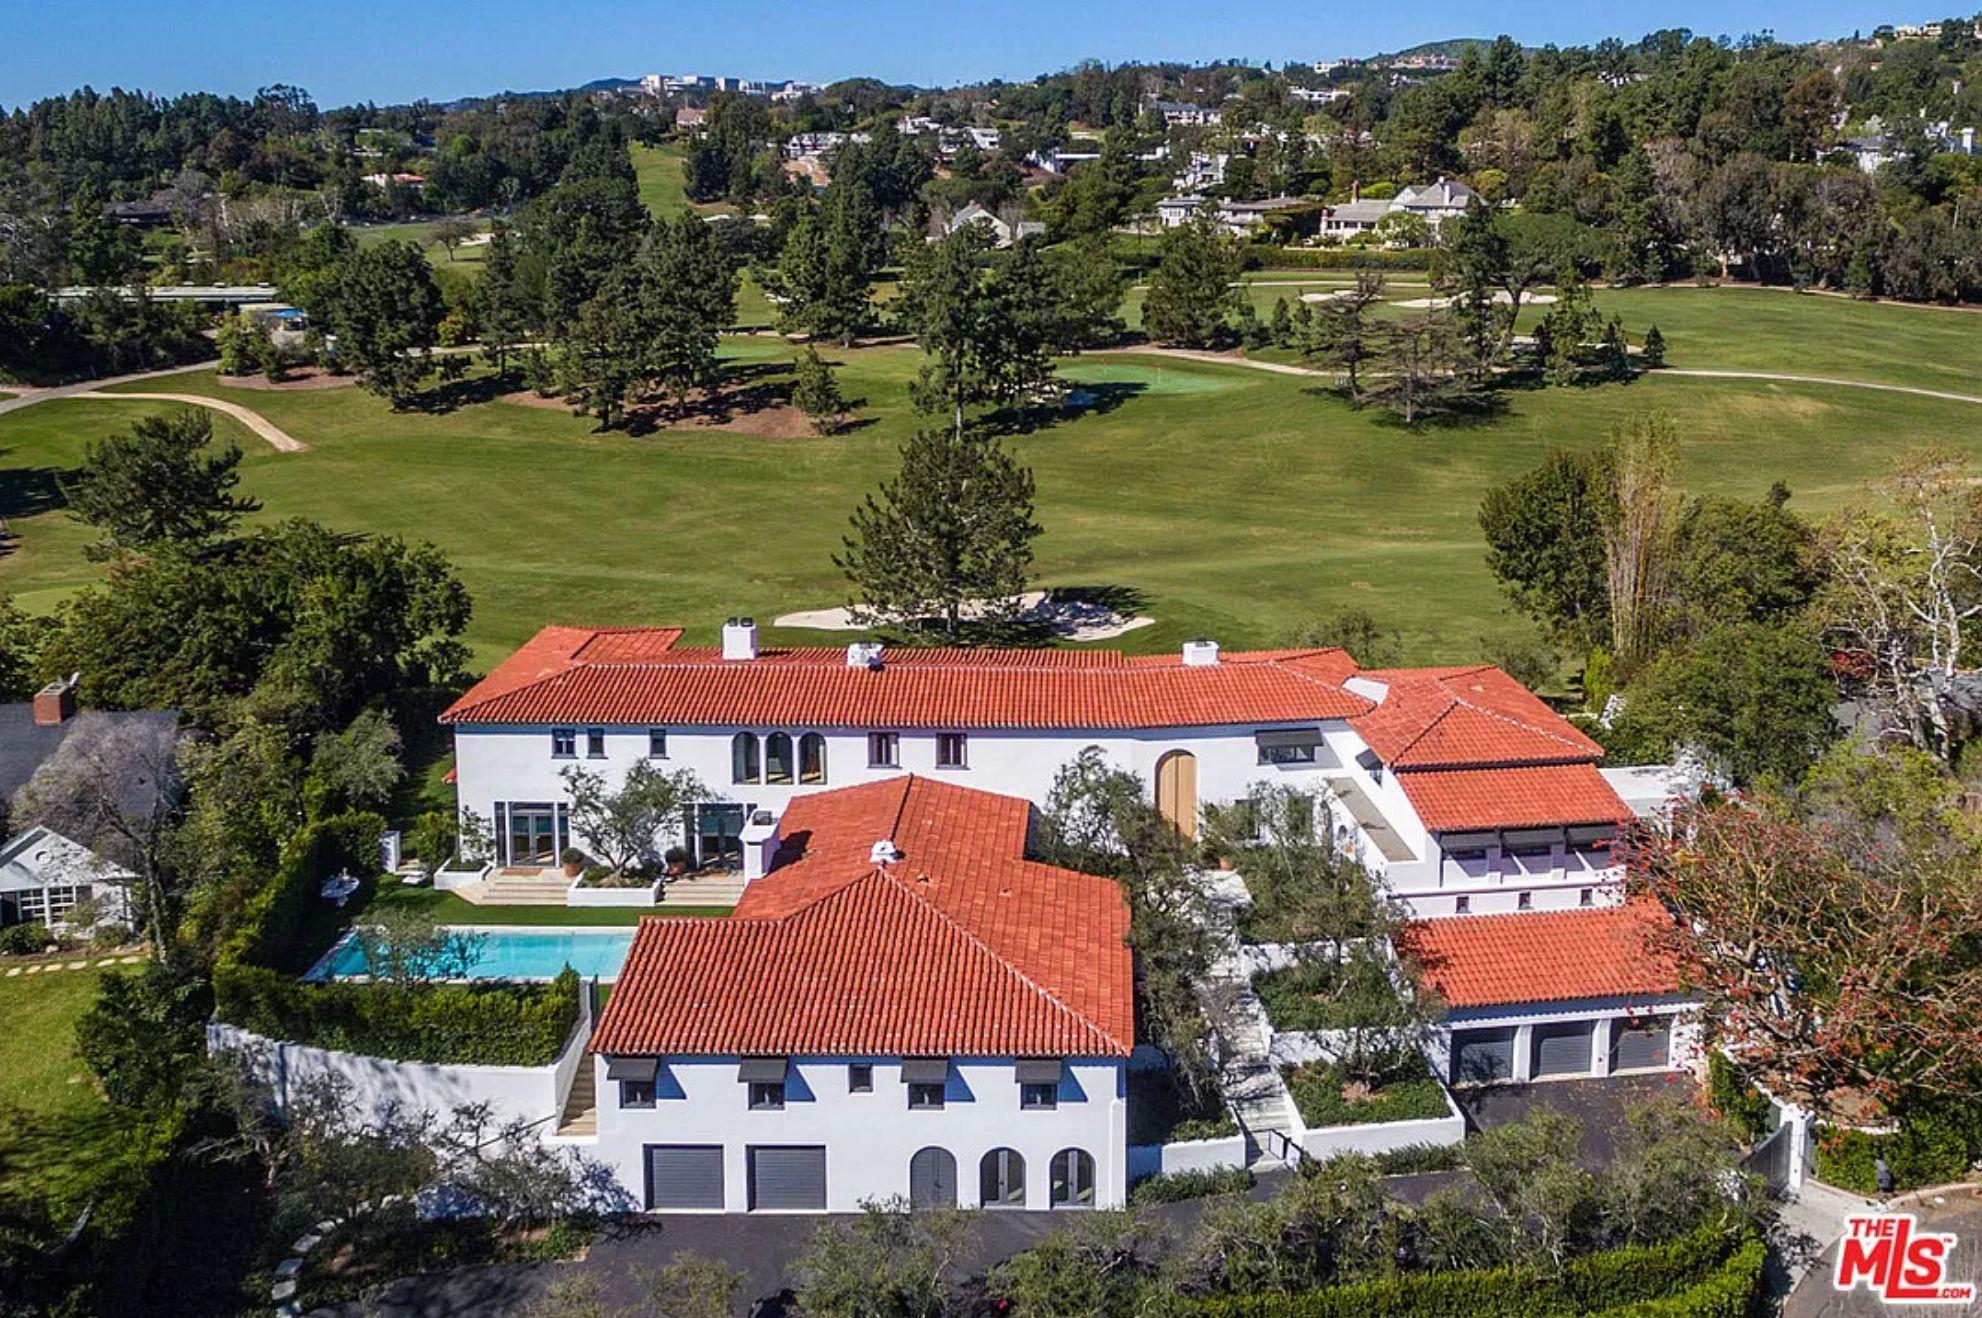 Lori Loughlin's $ 28 million Bel Air Villa is for sale